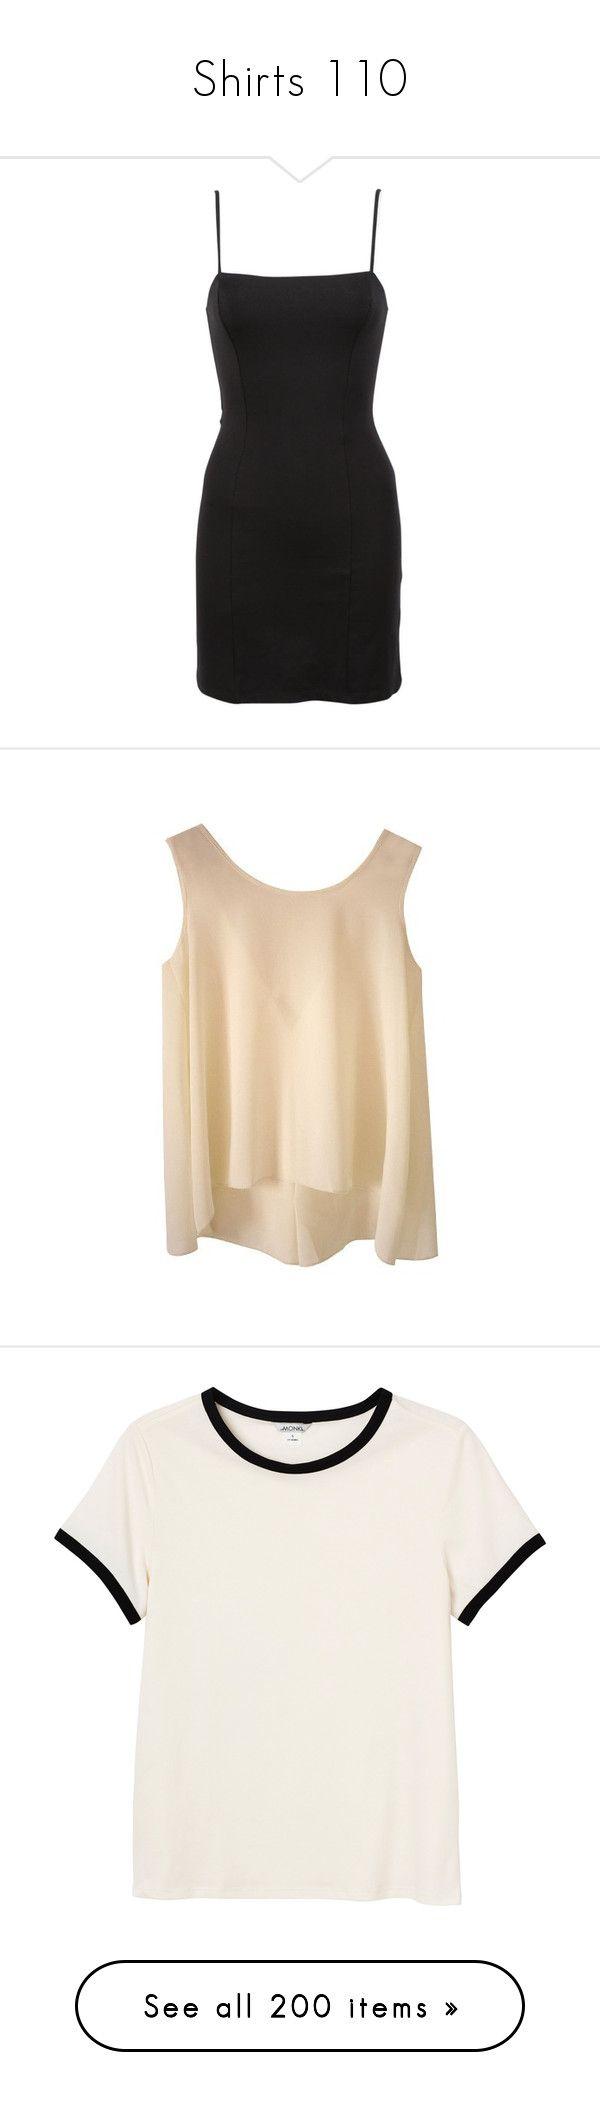 Amazon.com: 27 Dresses: Brian Kerwin, Charli Barcena ...